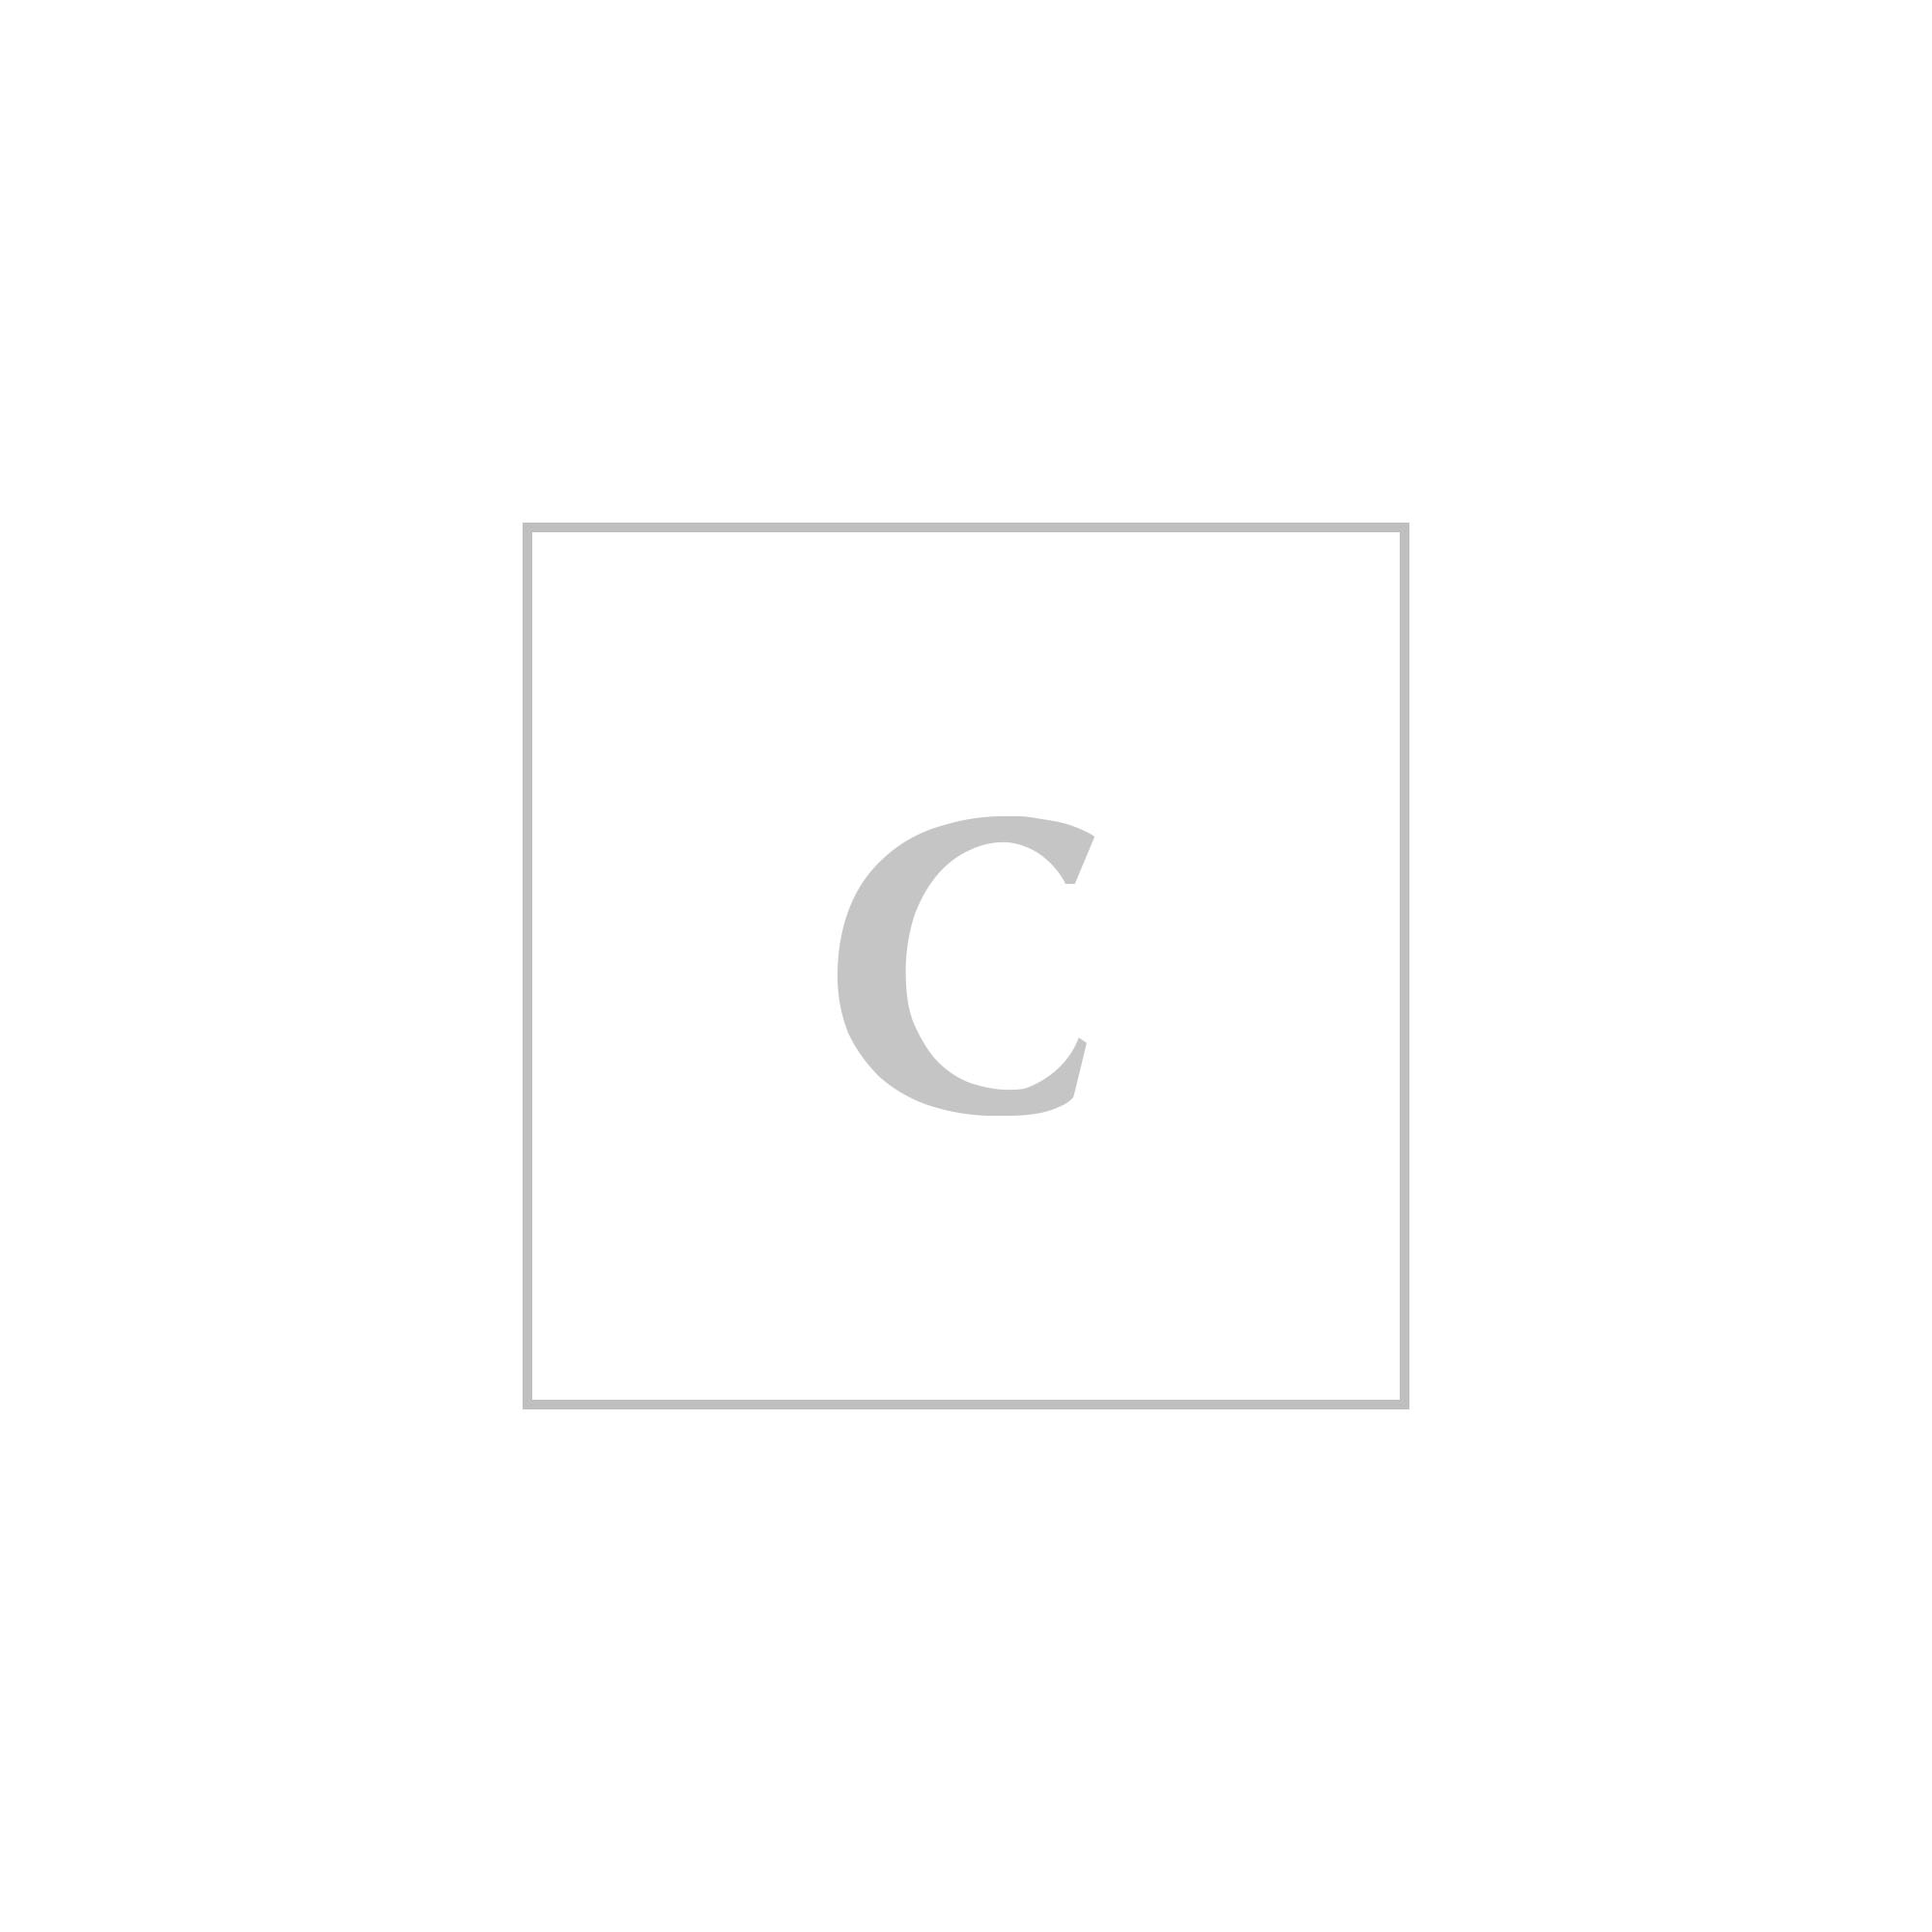 Stella mccartney borsa mini tote black star print denim falabella